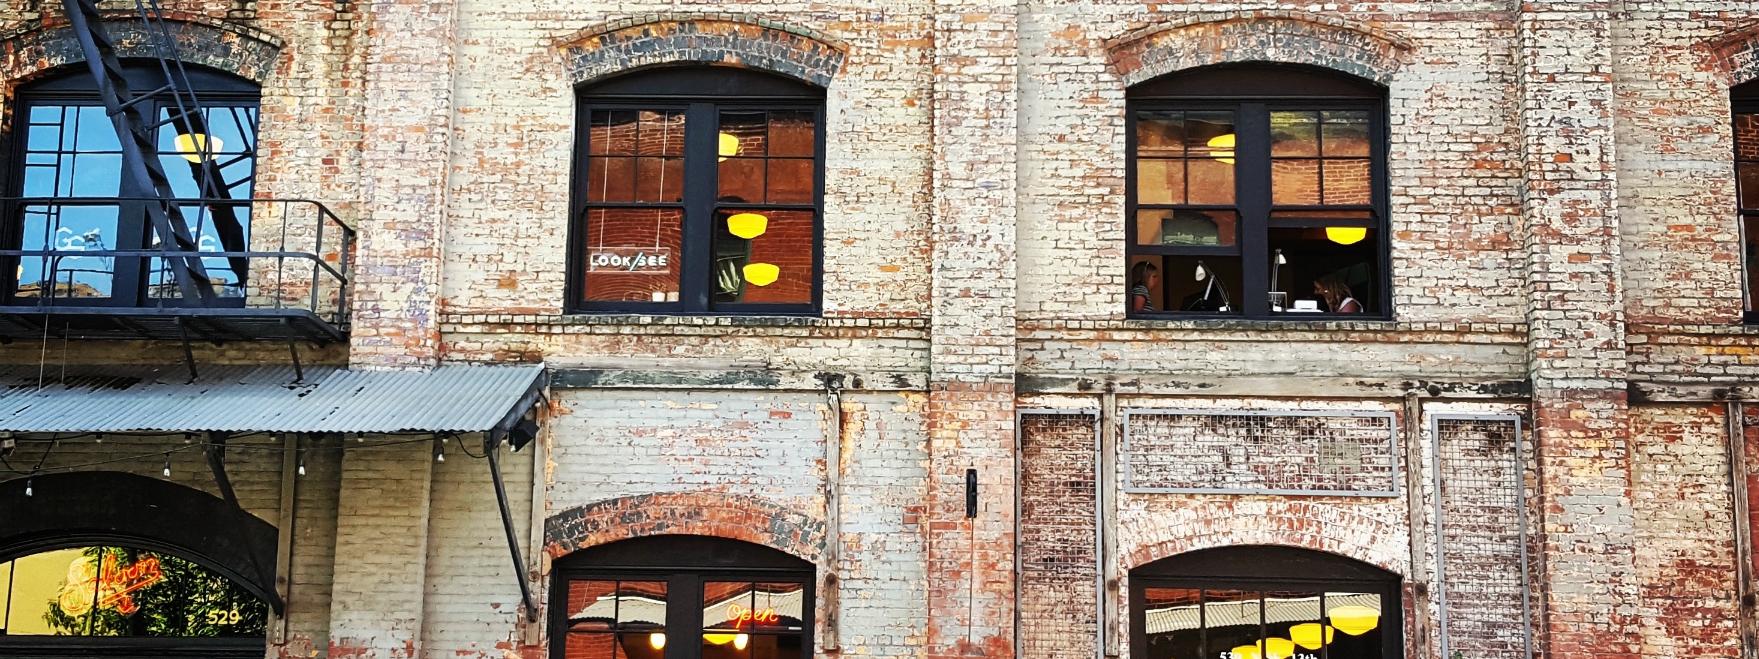 Agenda for heritage: PR company Content Coms explains